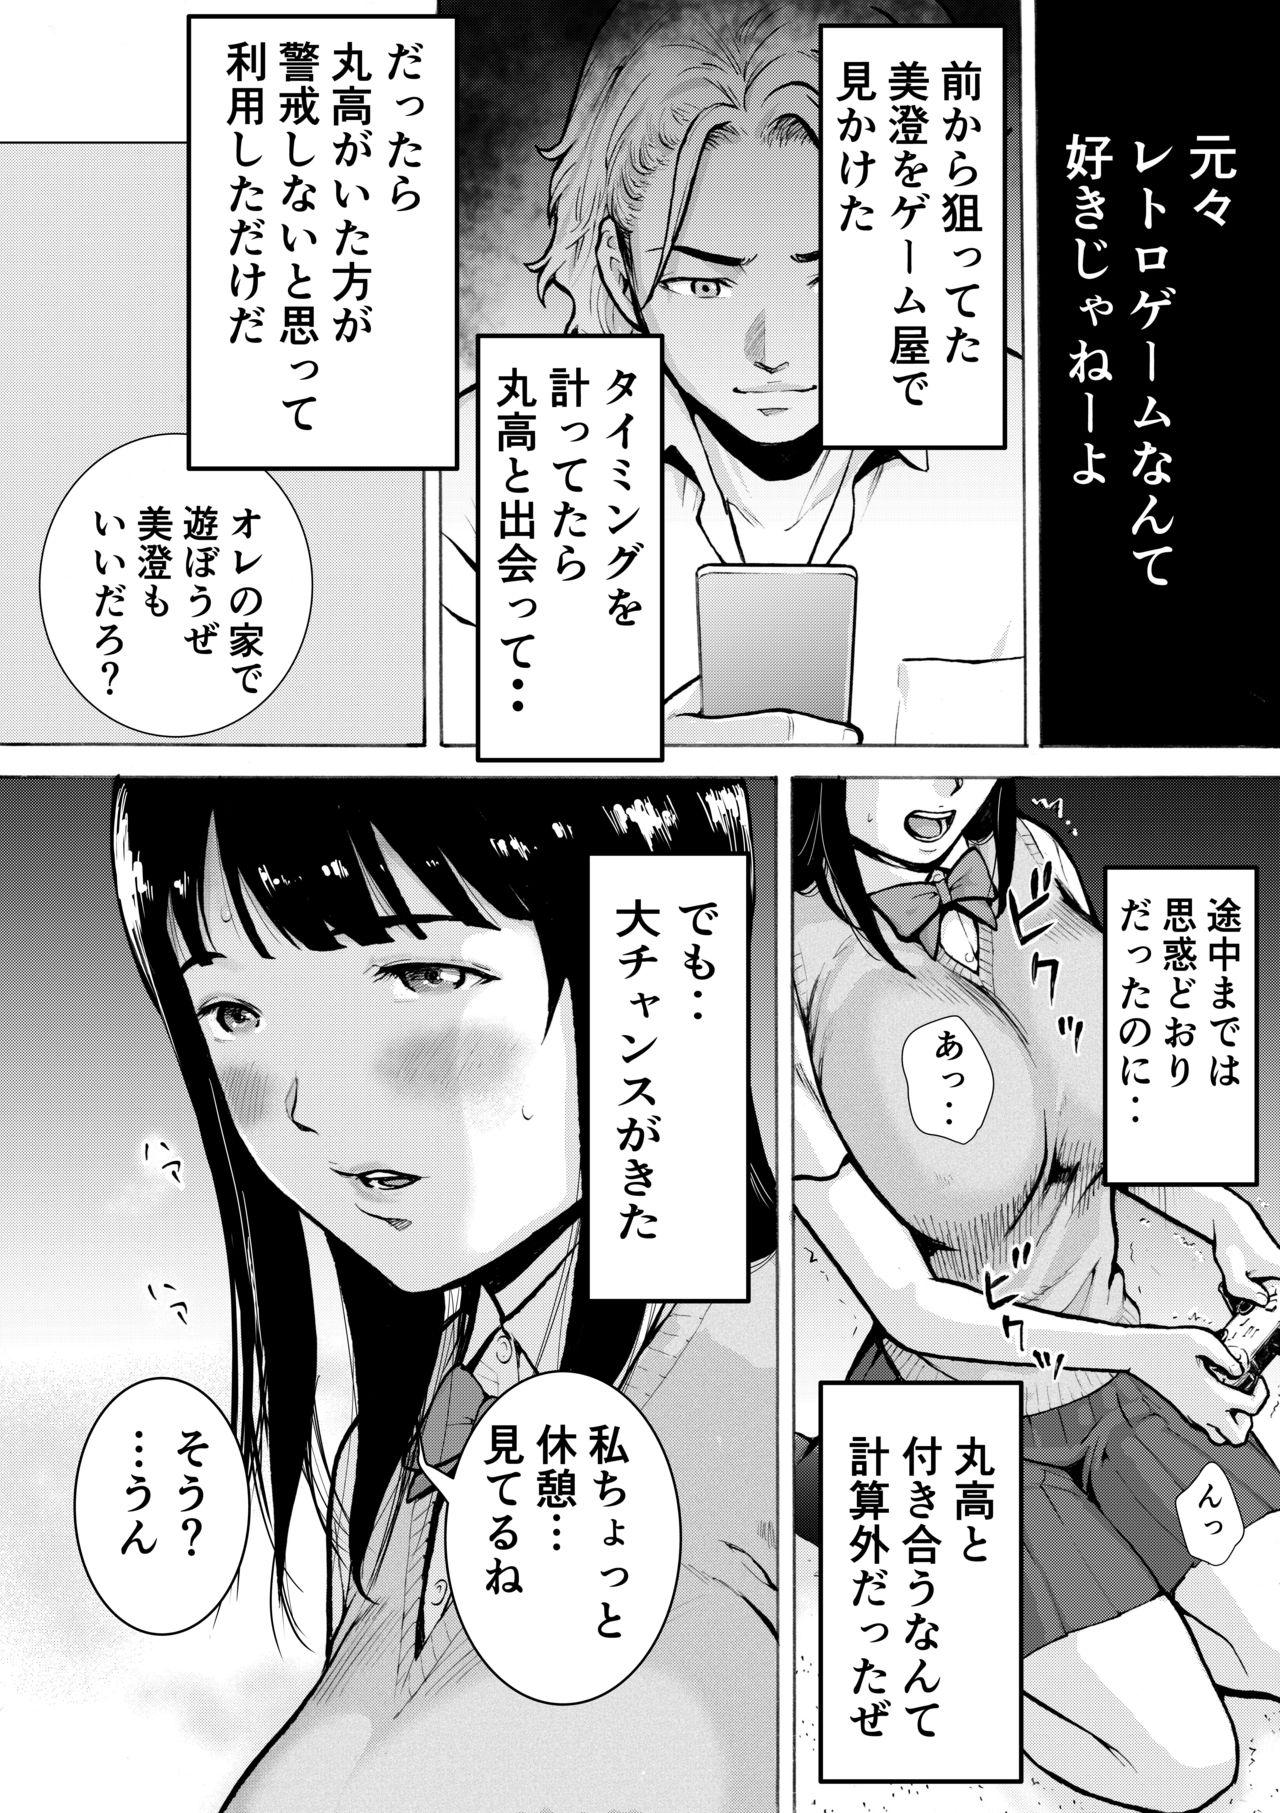 Retro Girl 22